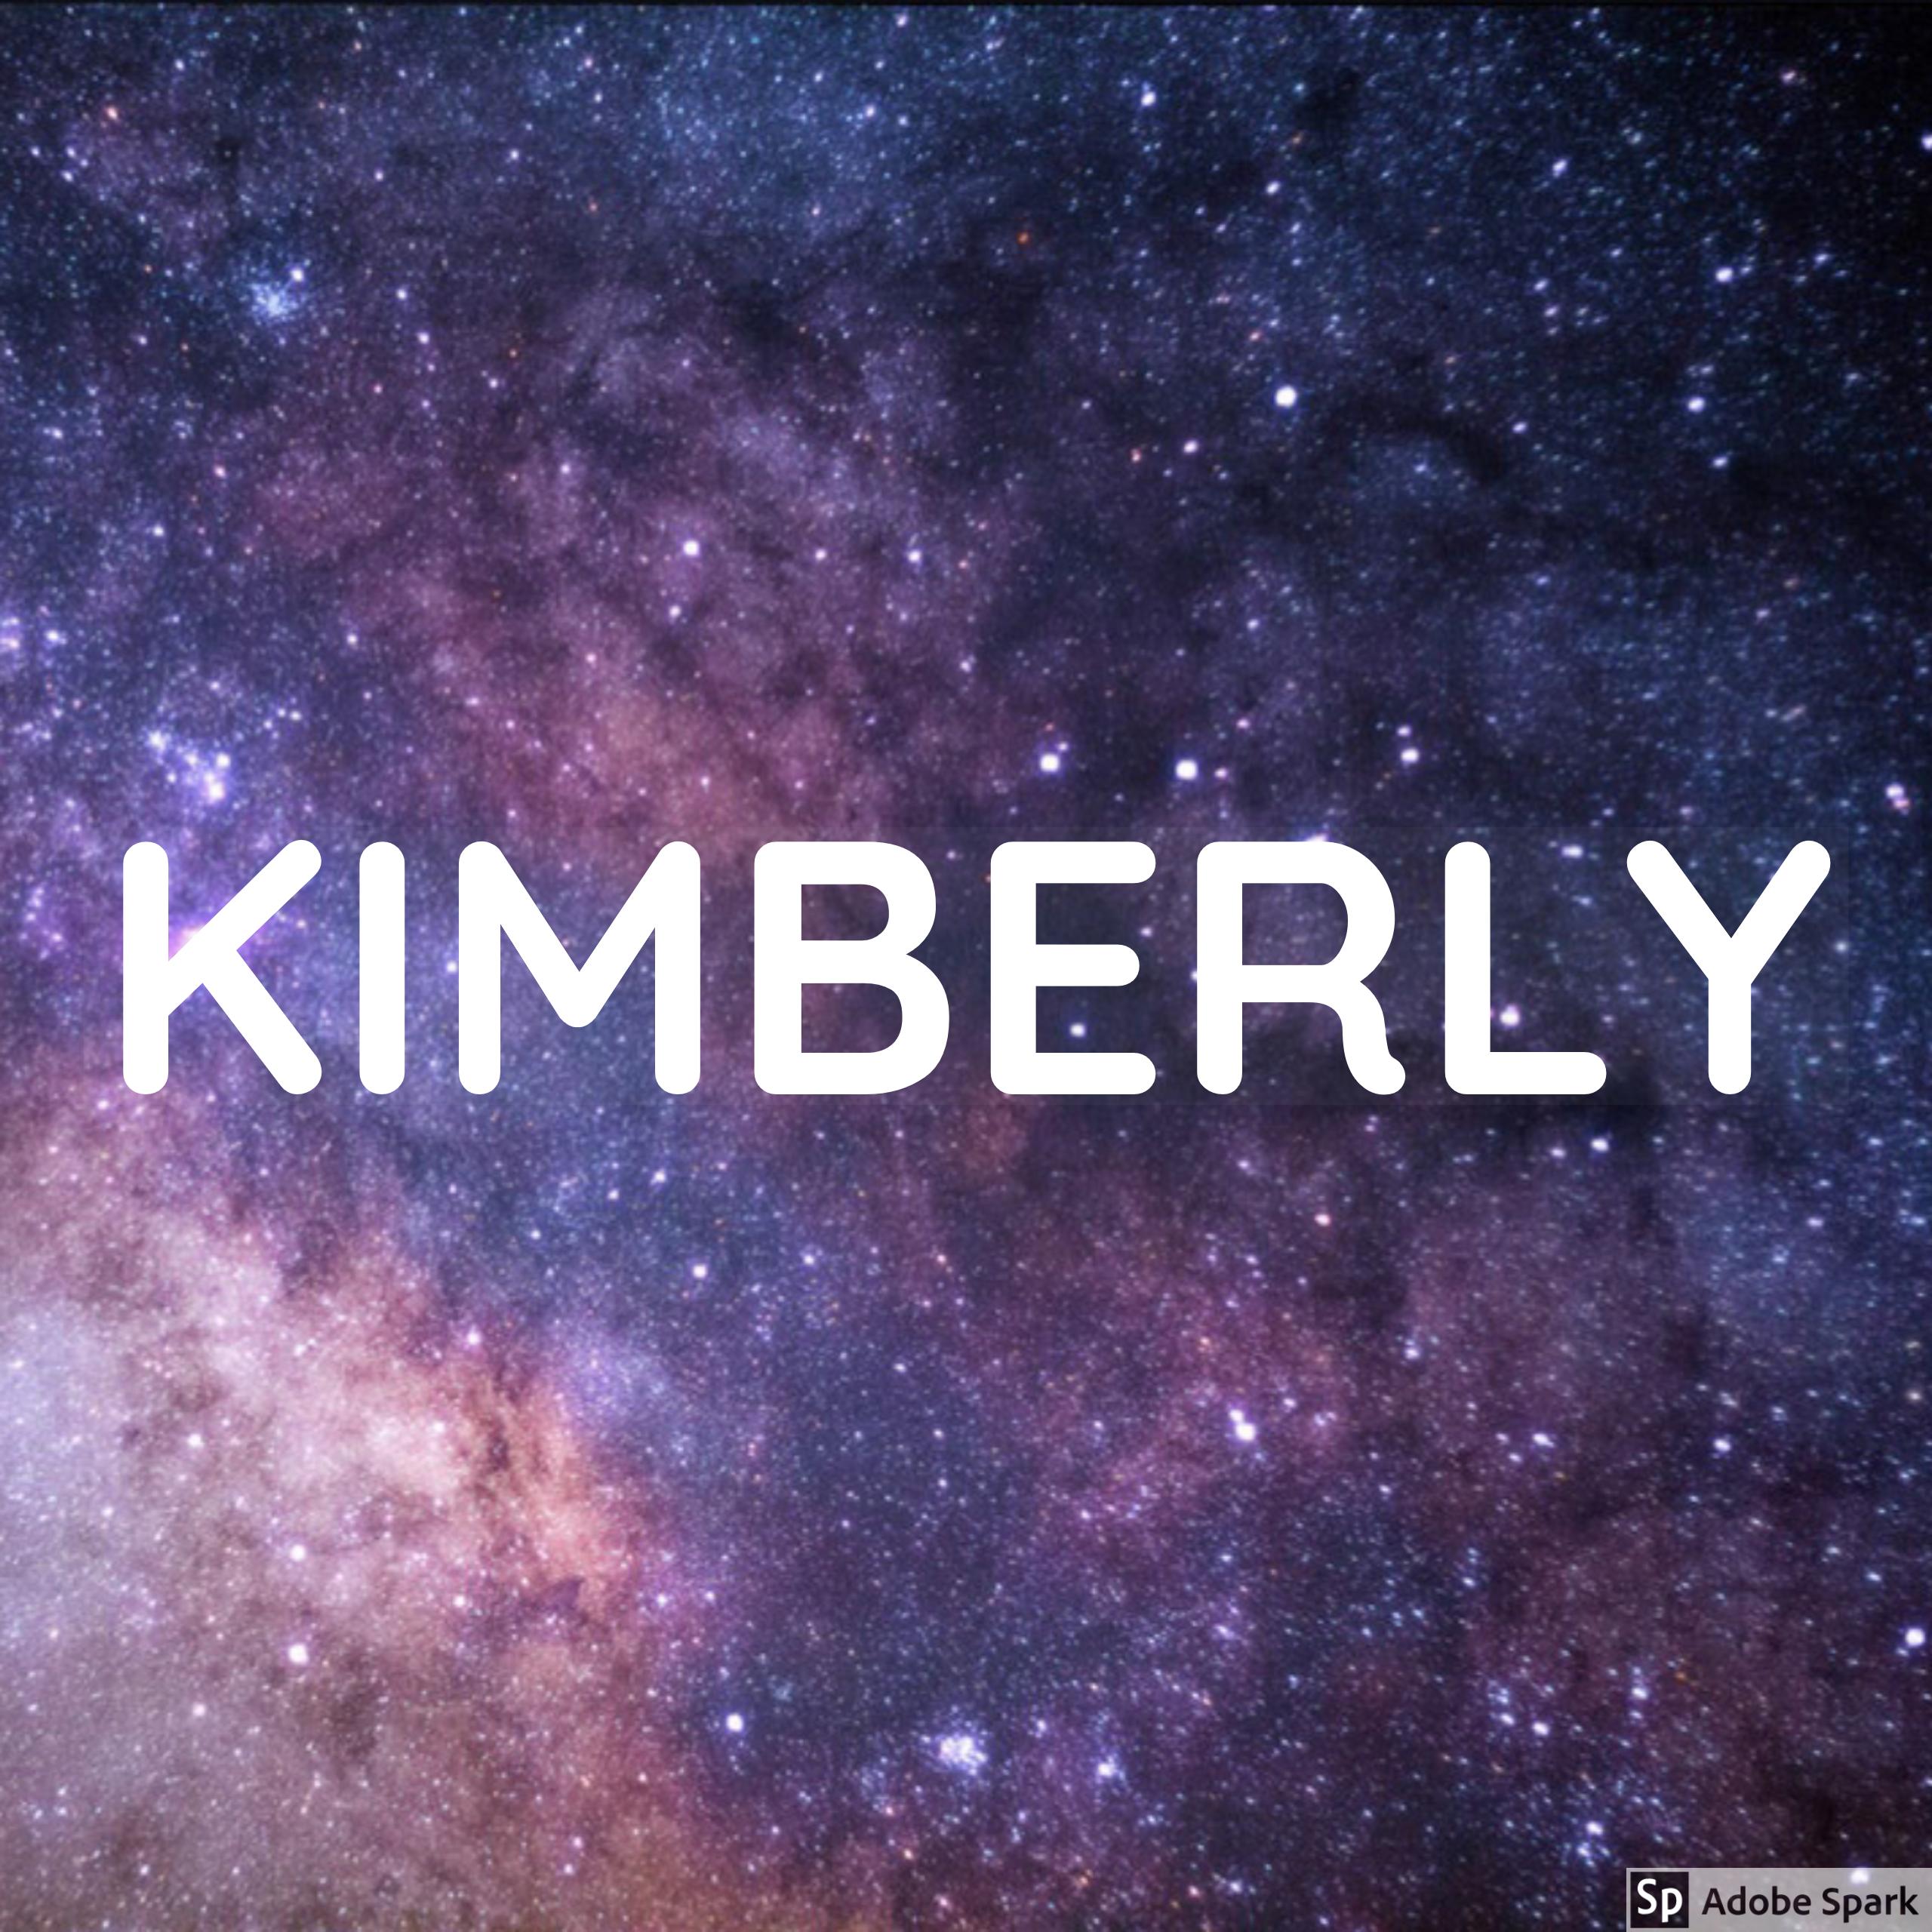 Kimberly Wallpaper Name Wallpaper Kimberly Names